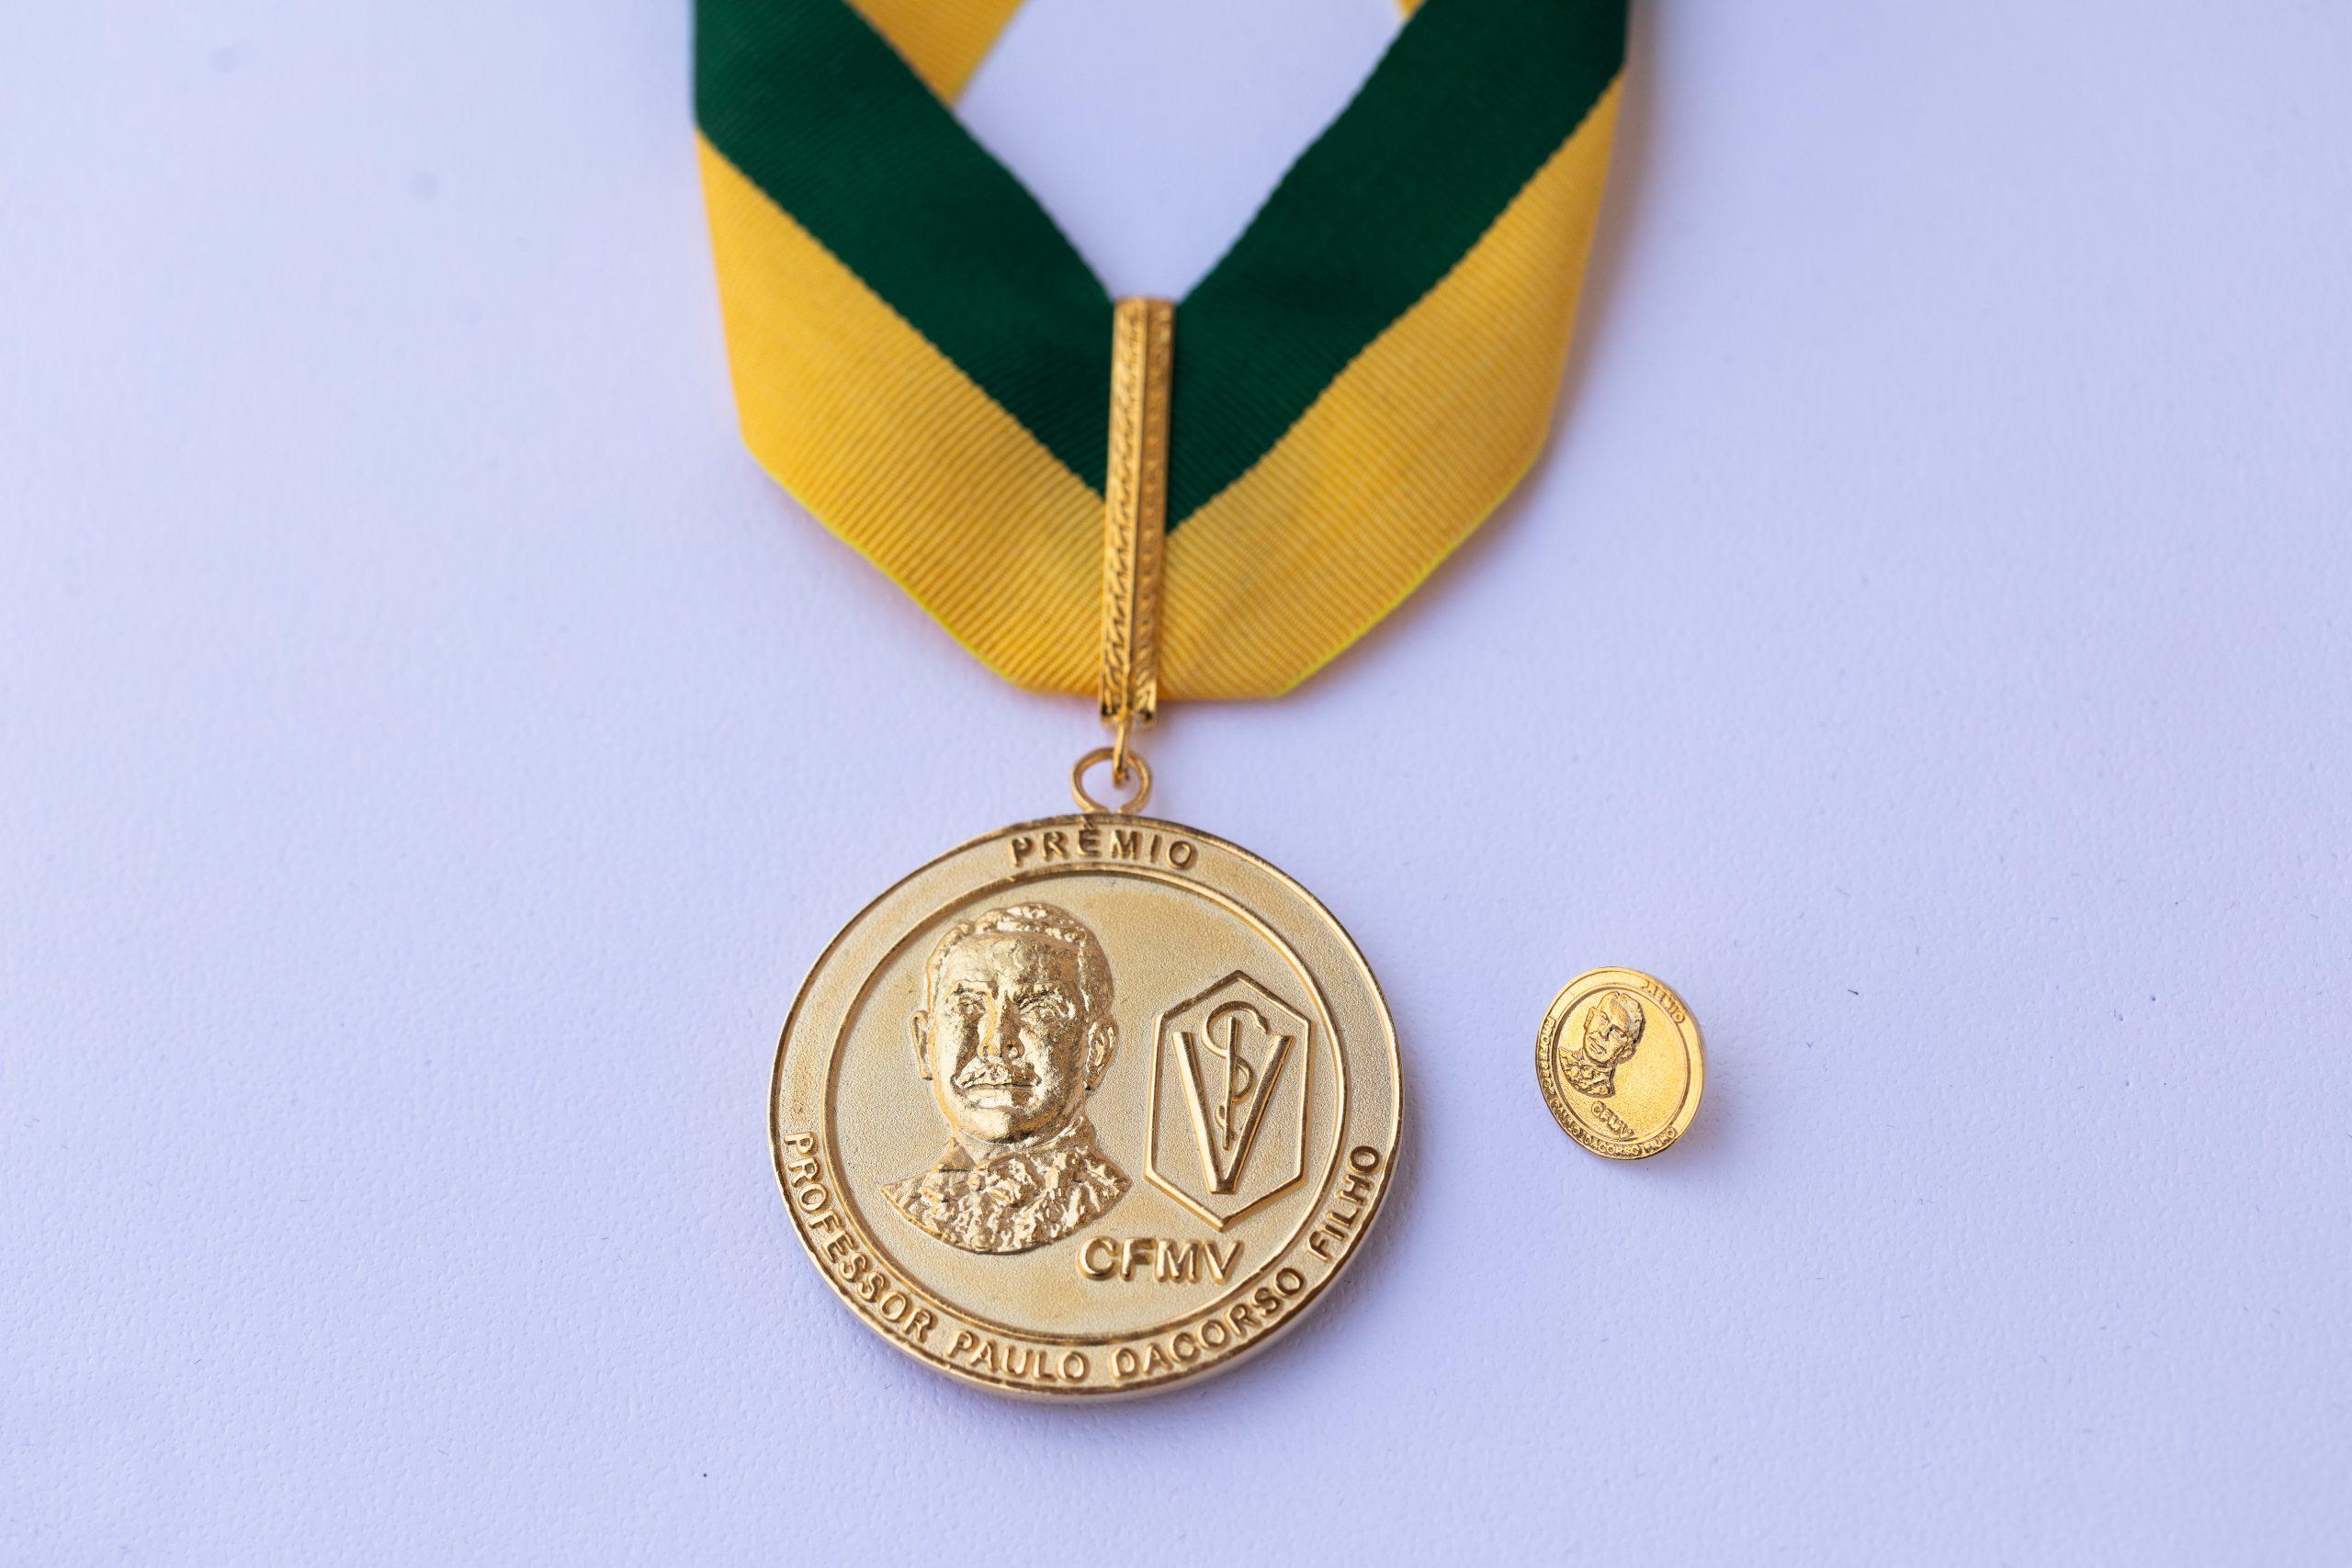 Prêmio Paulo Dacorso